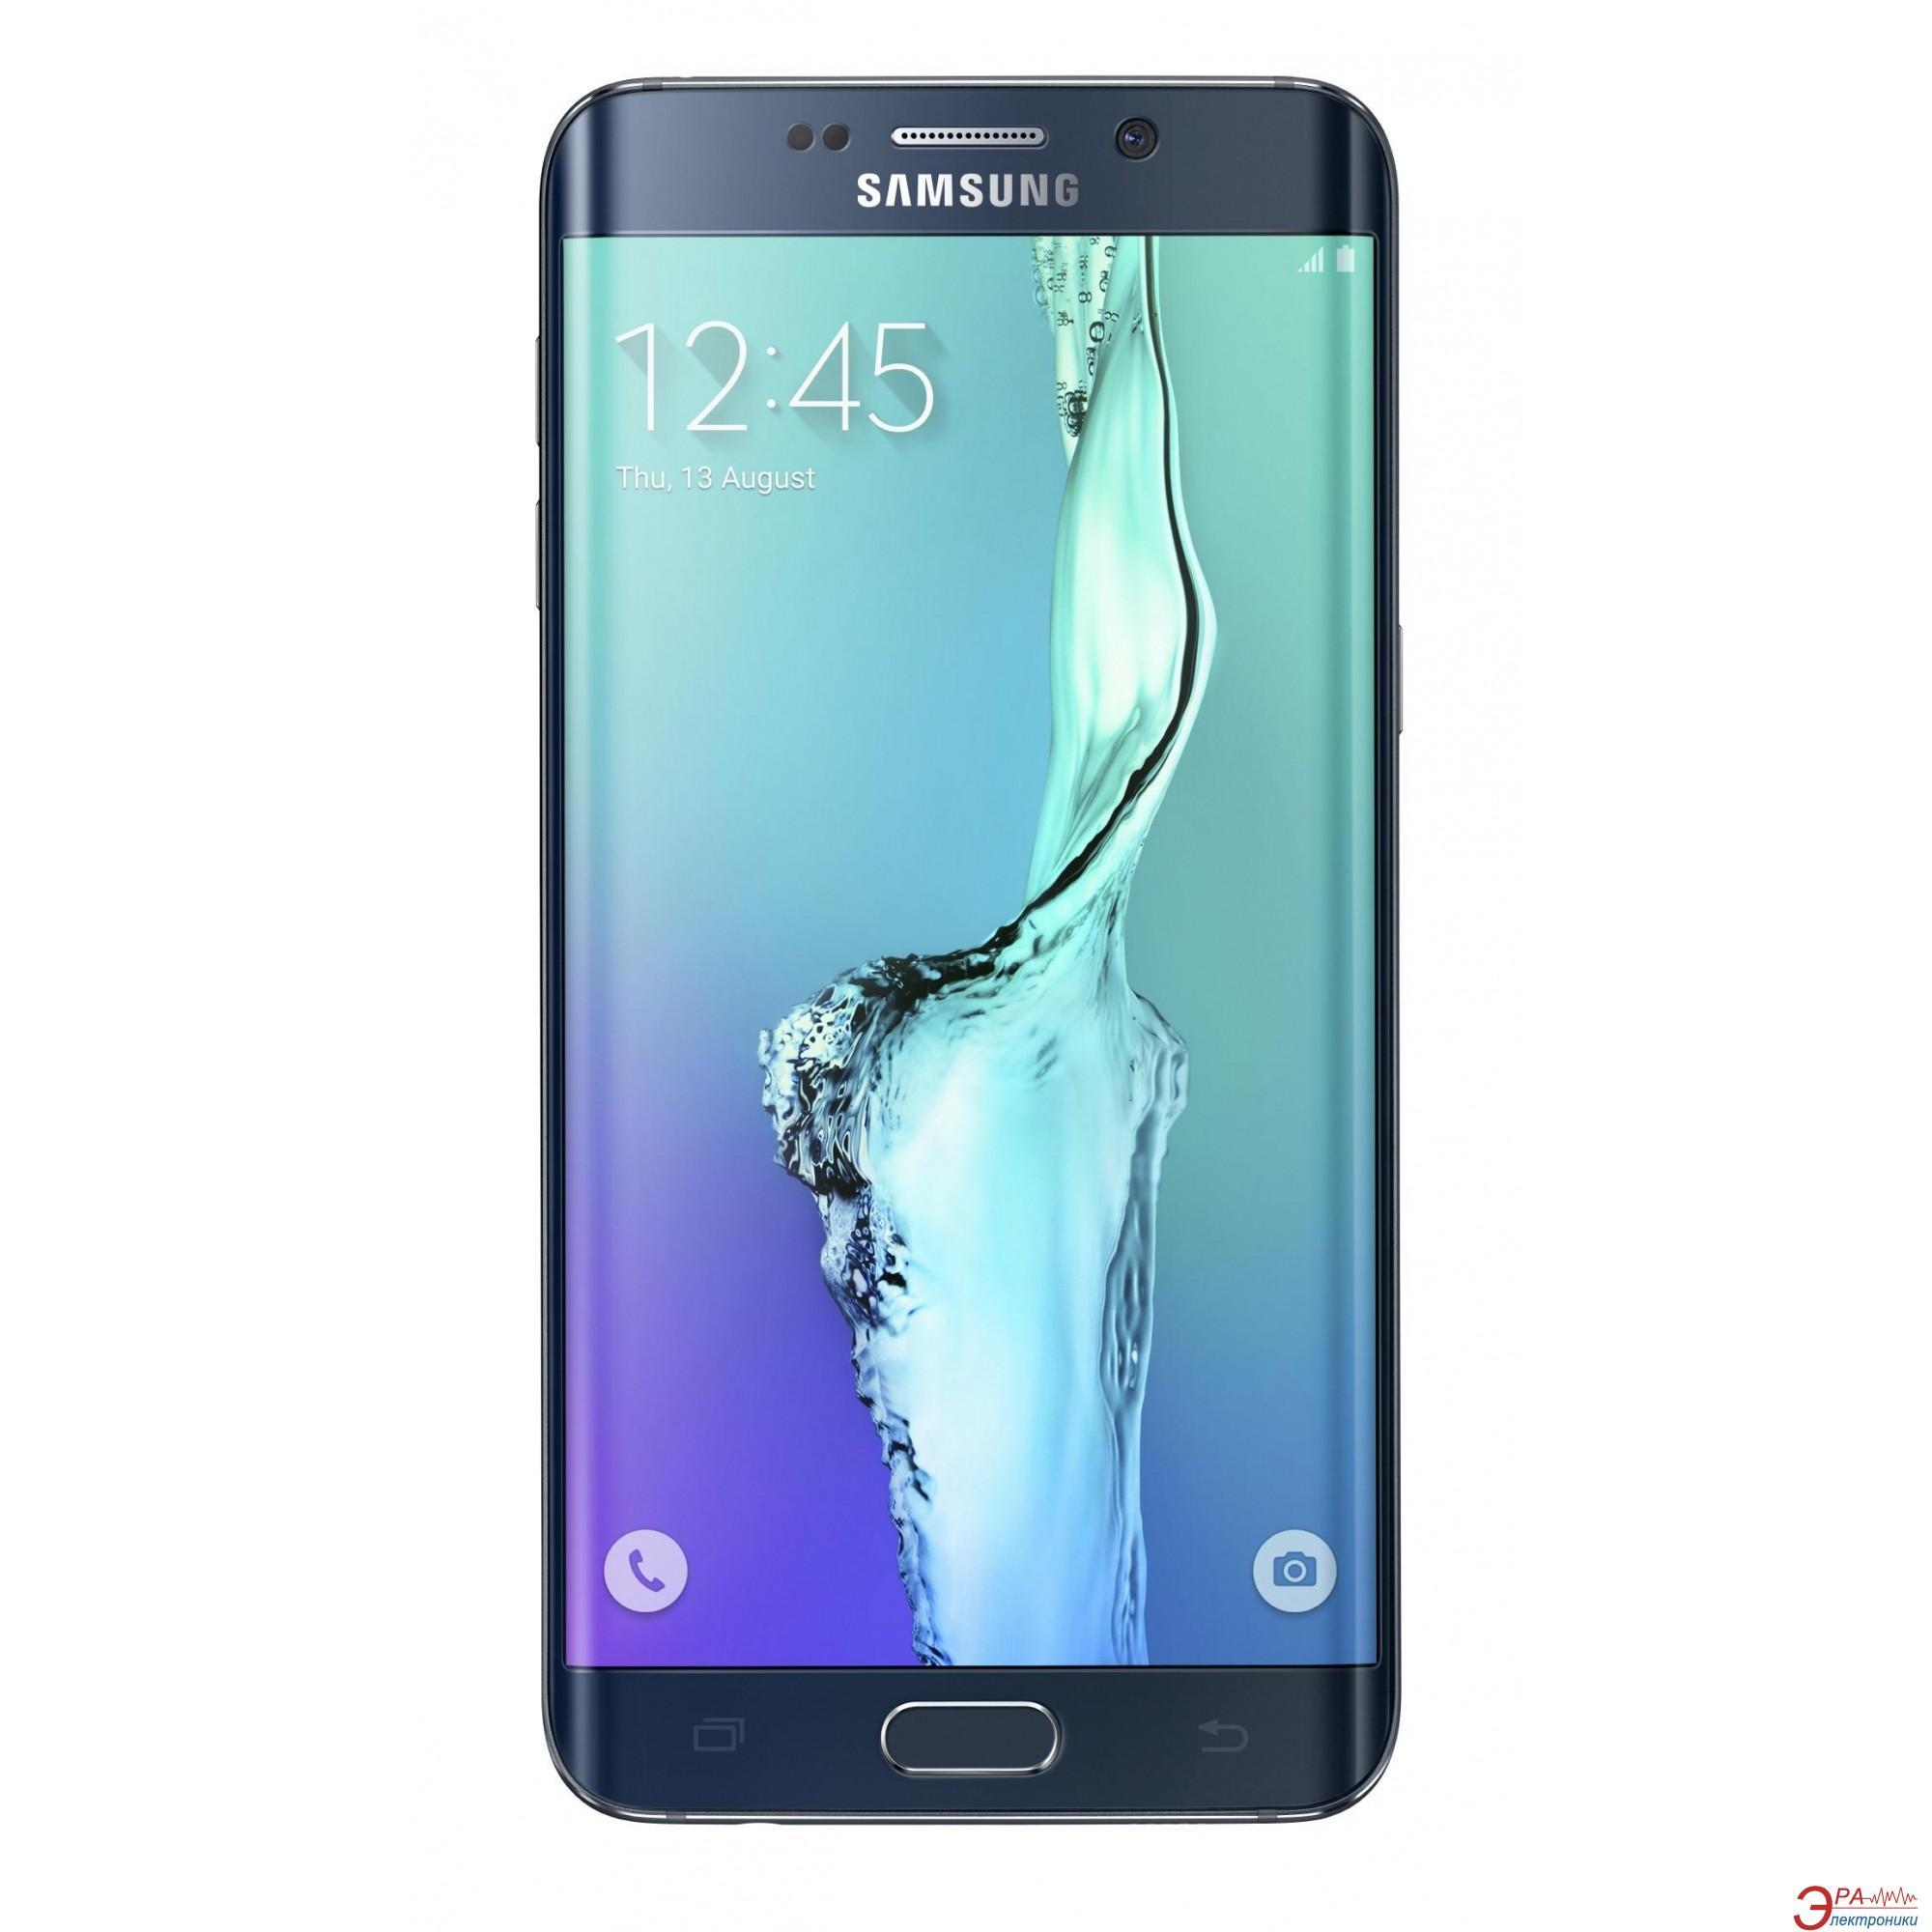 Смартфон Samsung Galaxy S6 Edge Plus 32Gb Black (SM-G928FZKASEK)